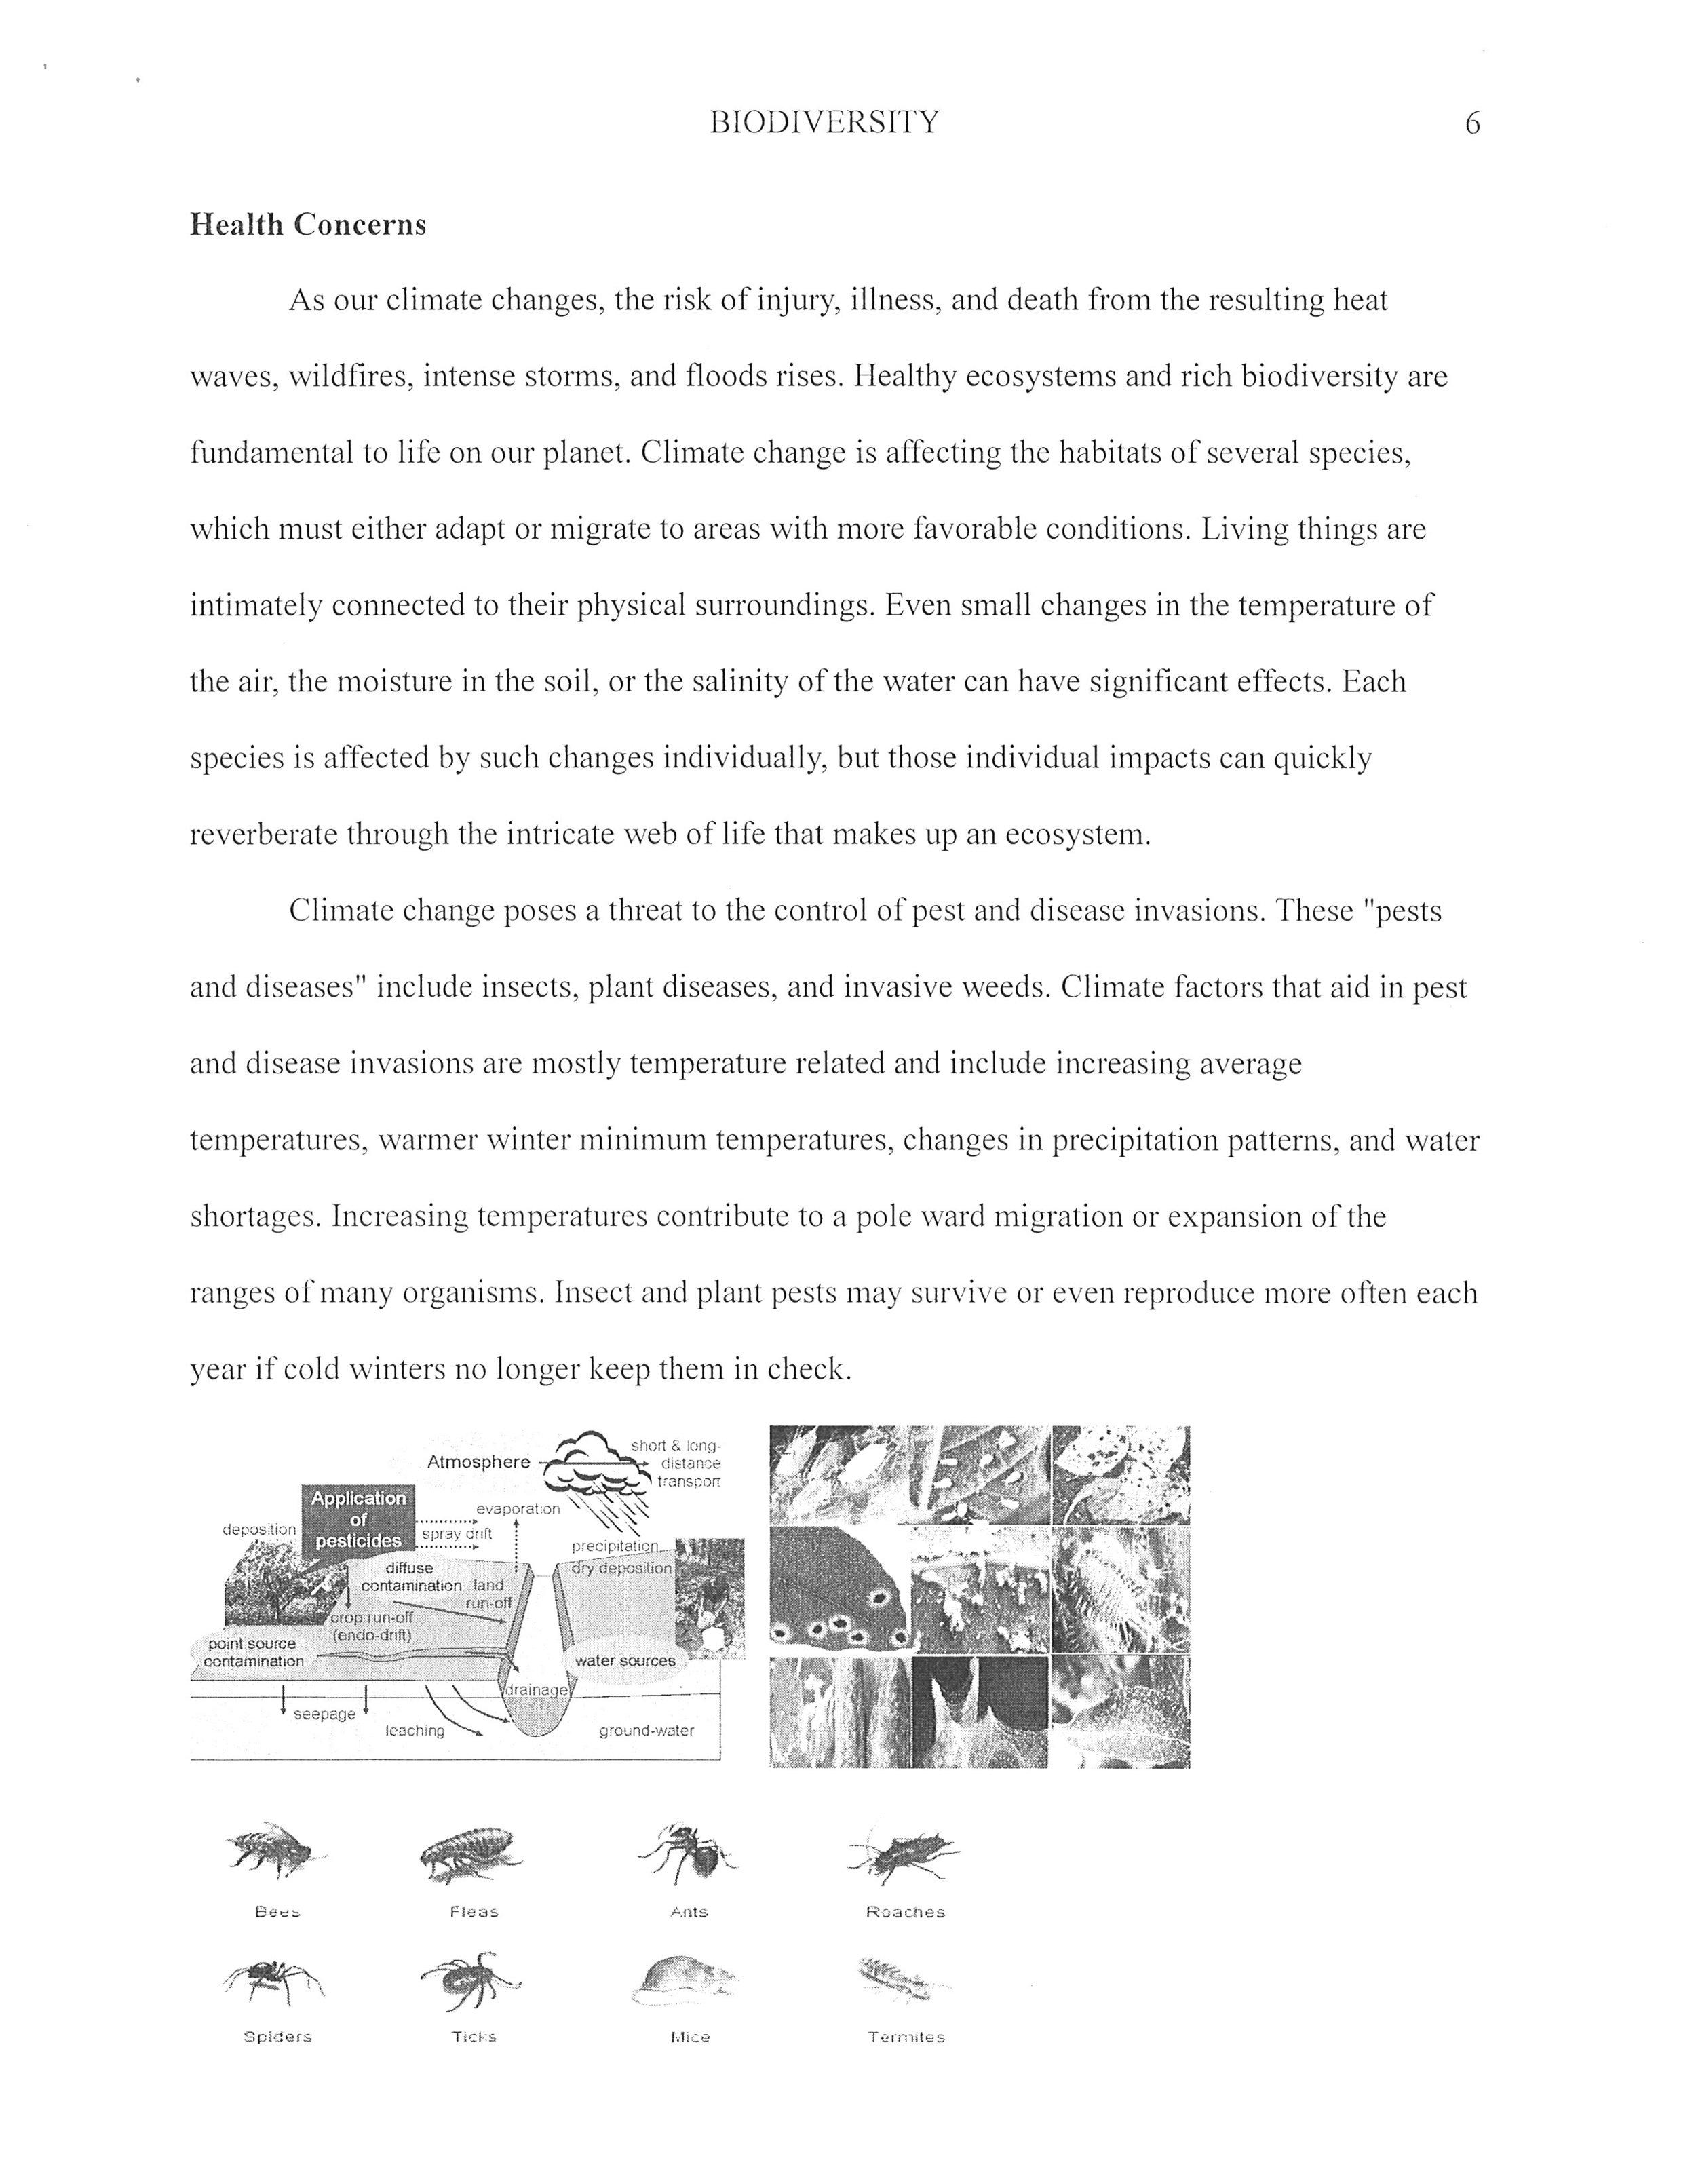 9. Scanned from a Xerox Multifunction Printer006.jpg